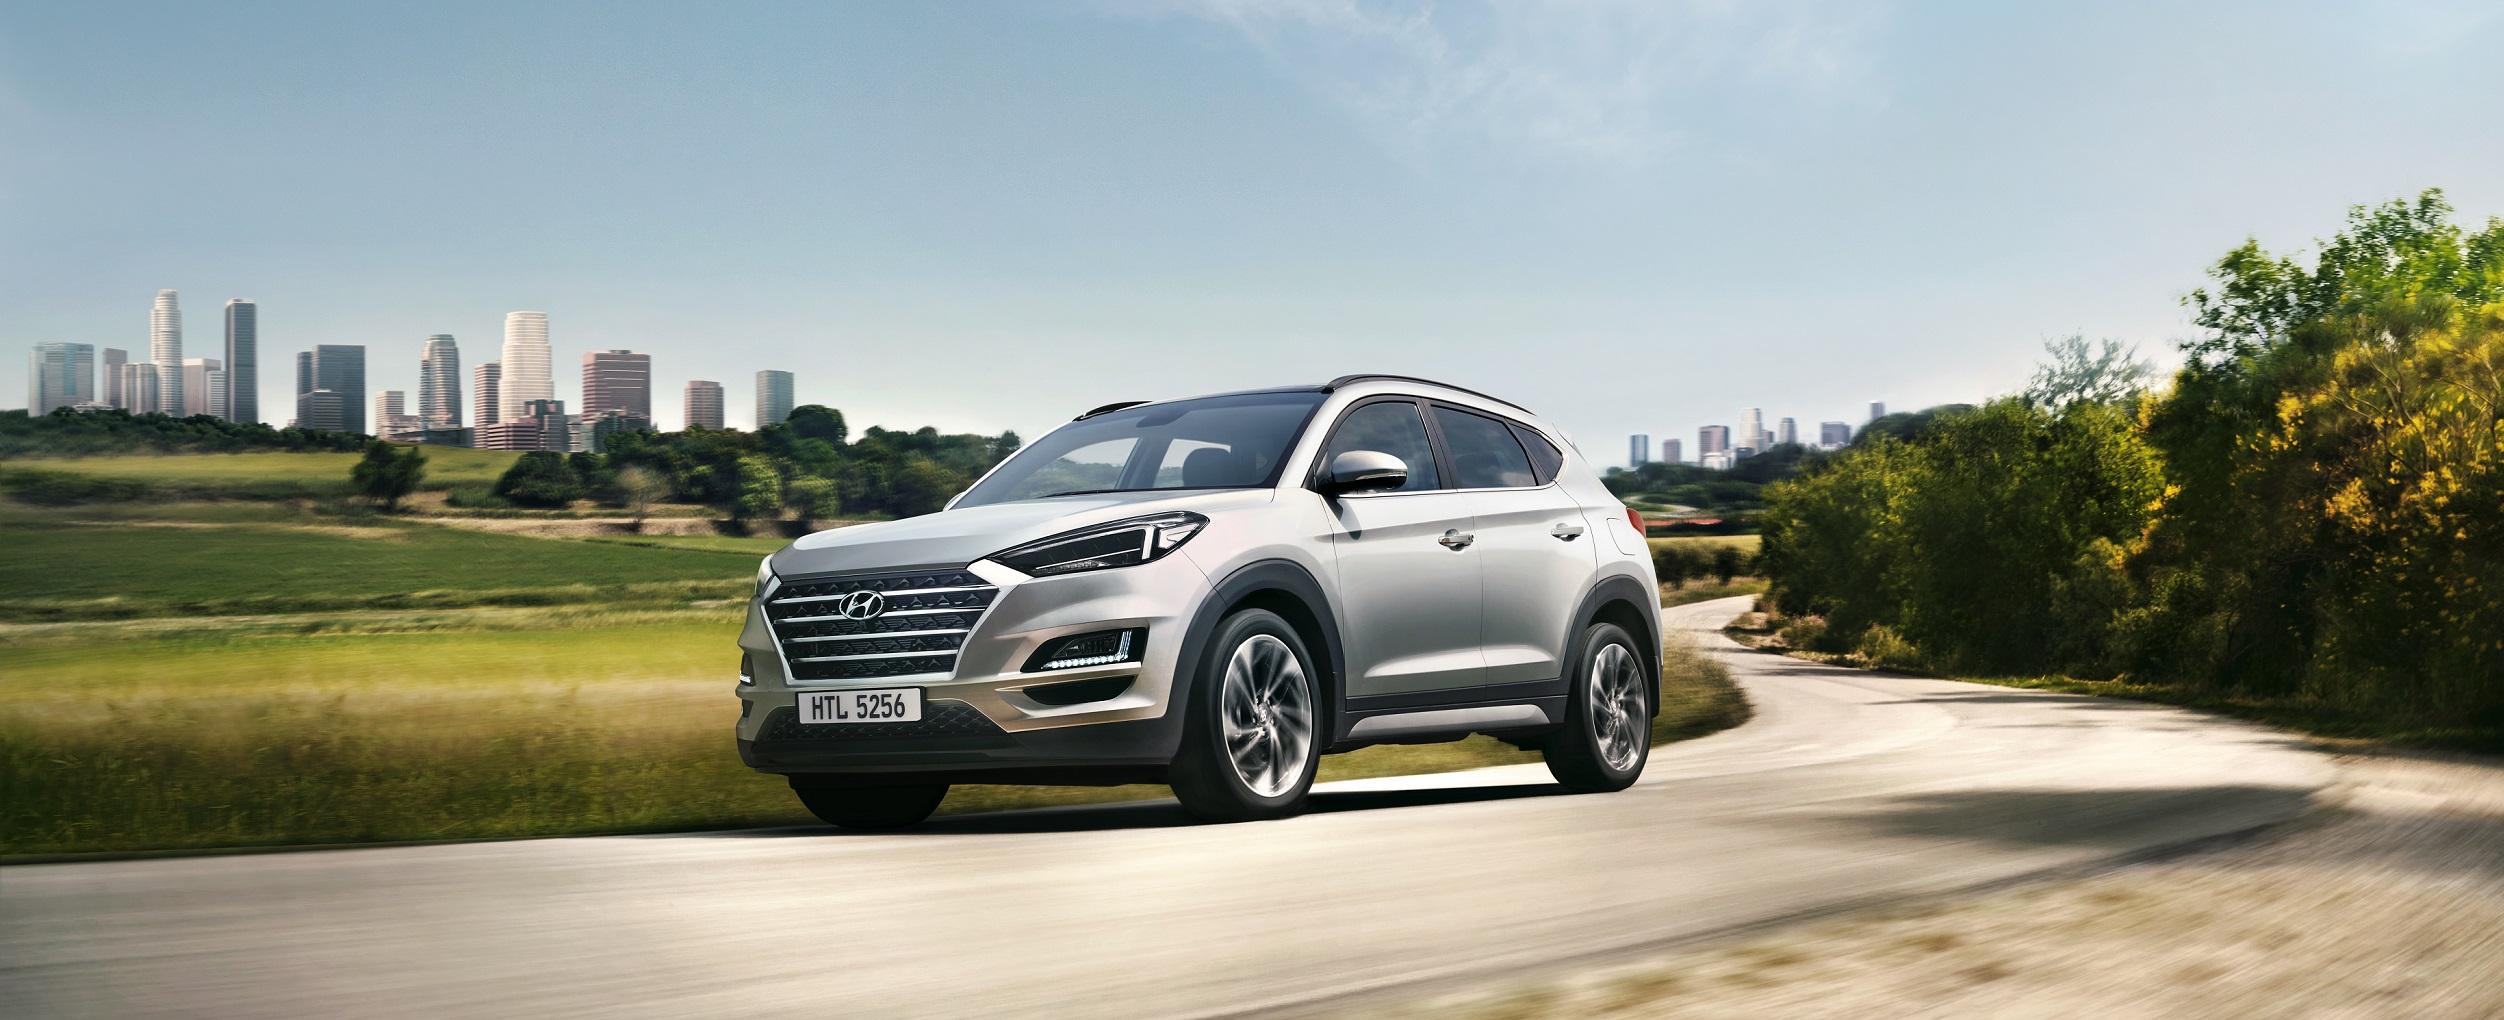 Hyundai - Nouveau TUCSON